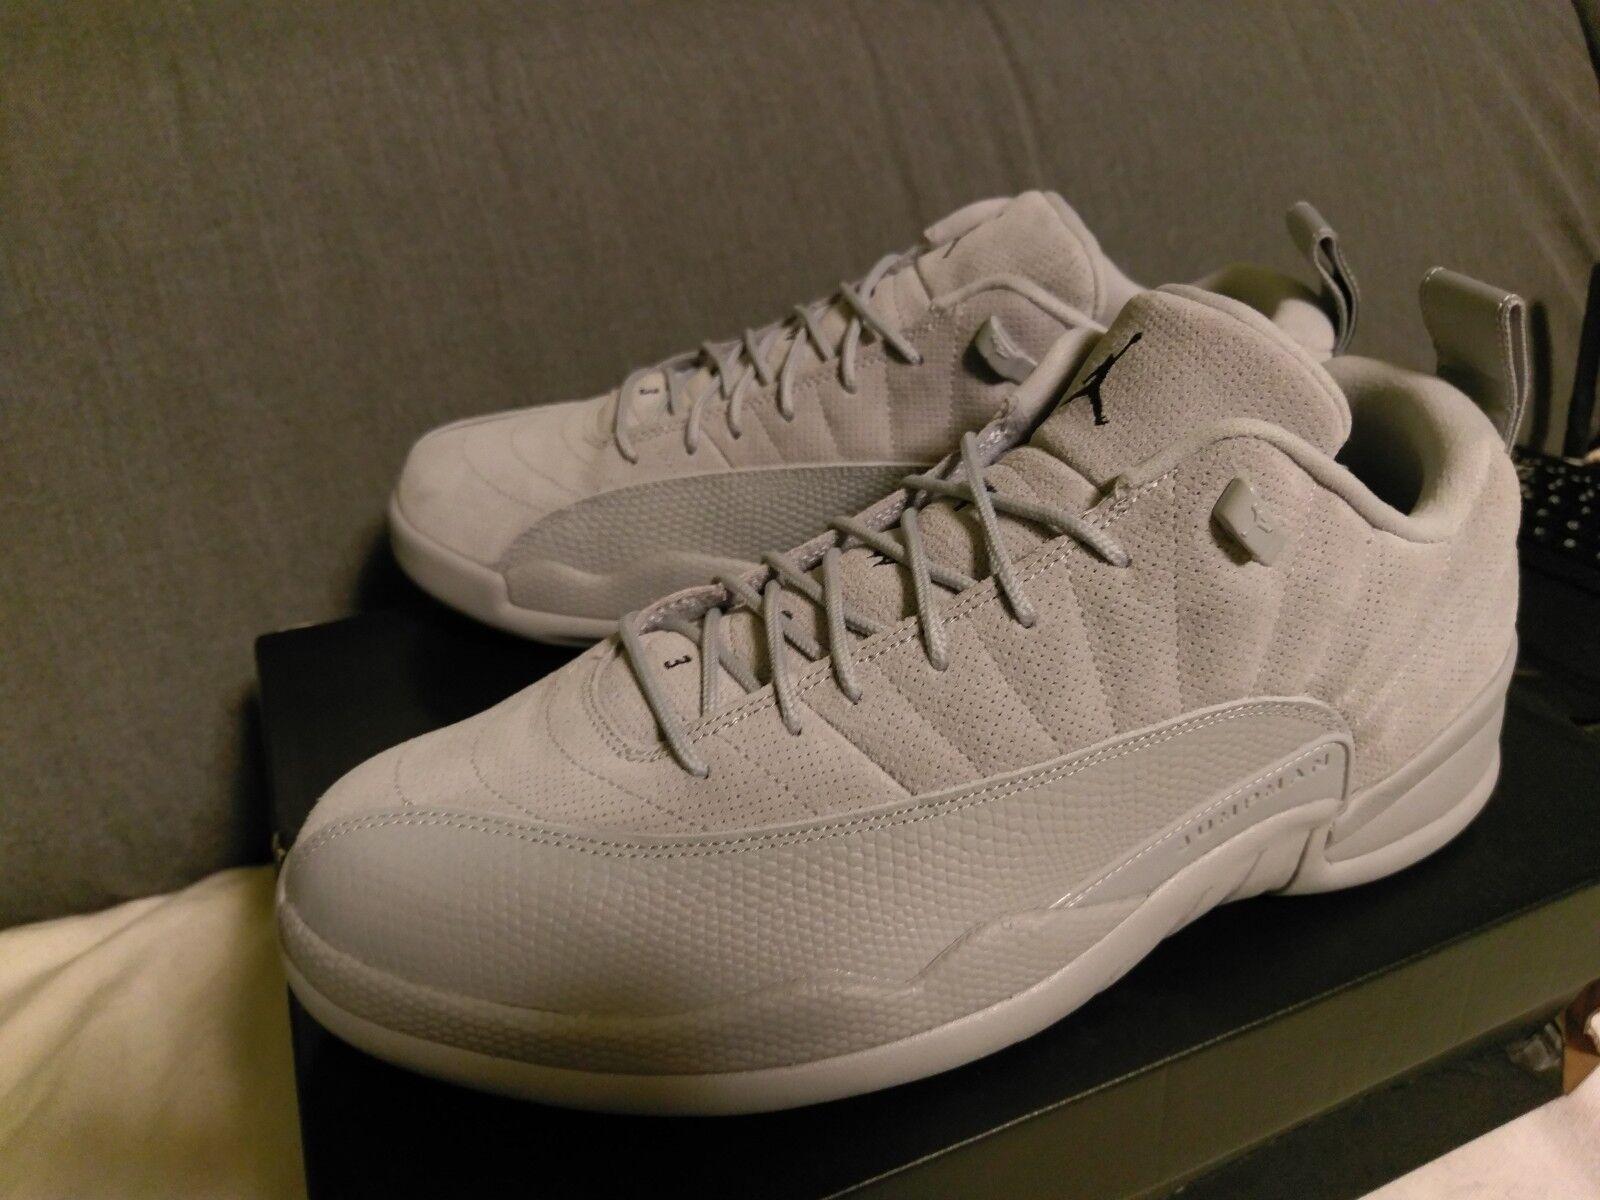 Neu Nike Air Jordan 12 Retro Low Low Low  Wolf grau  Größe 47,5 US 13 Nike Air    25f308